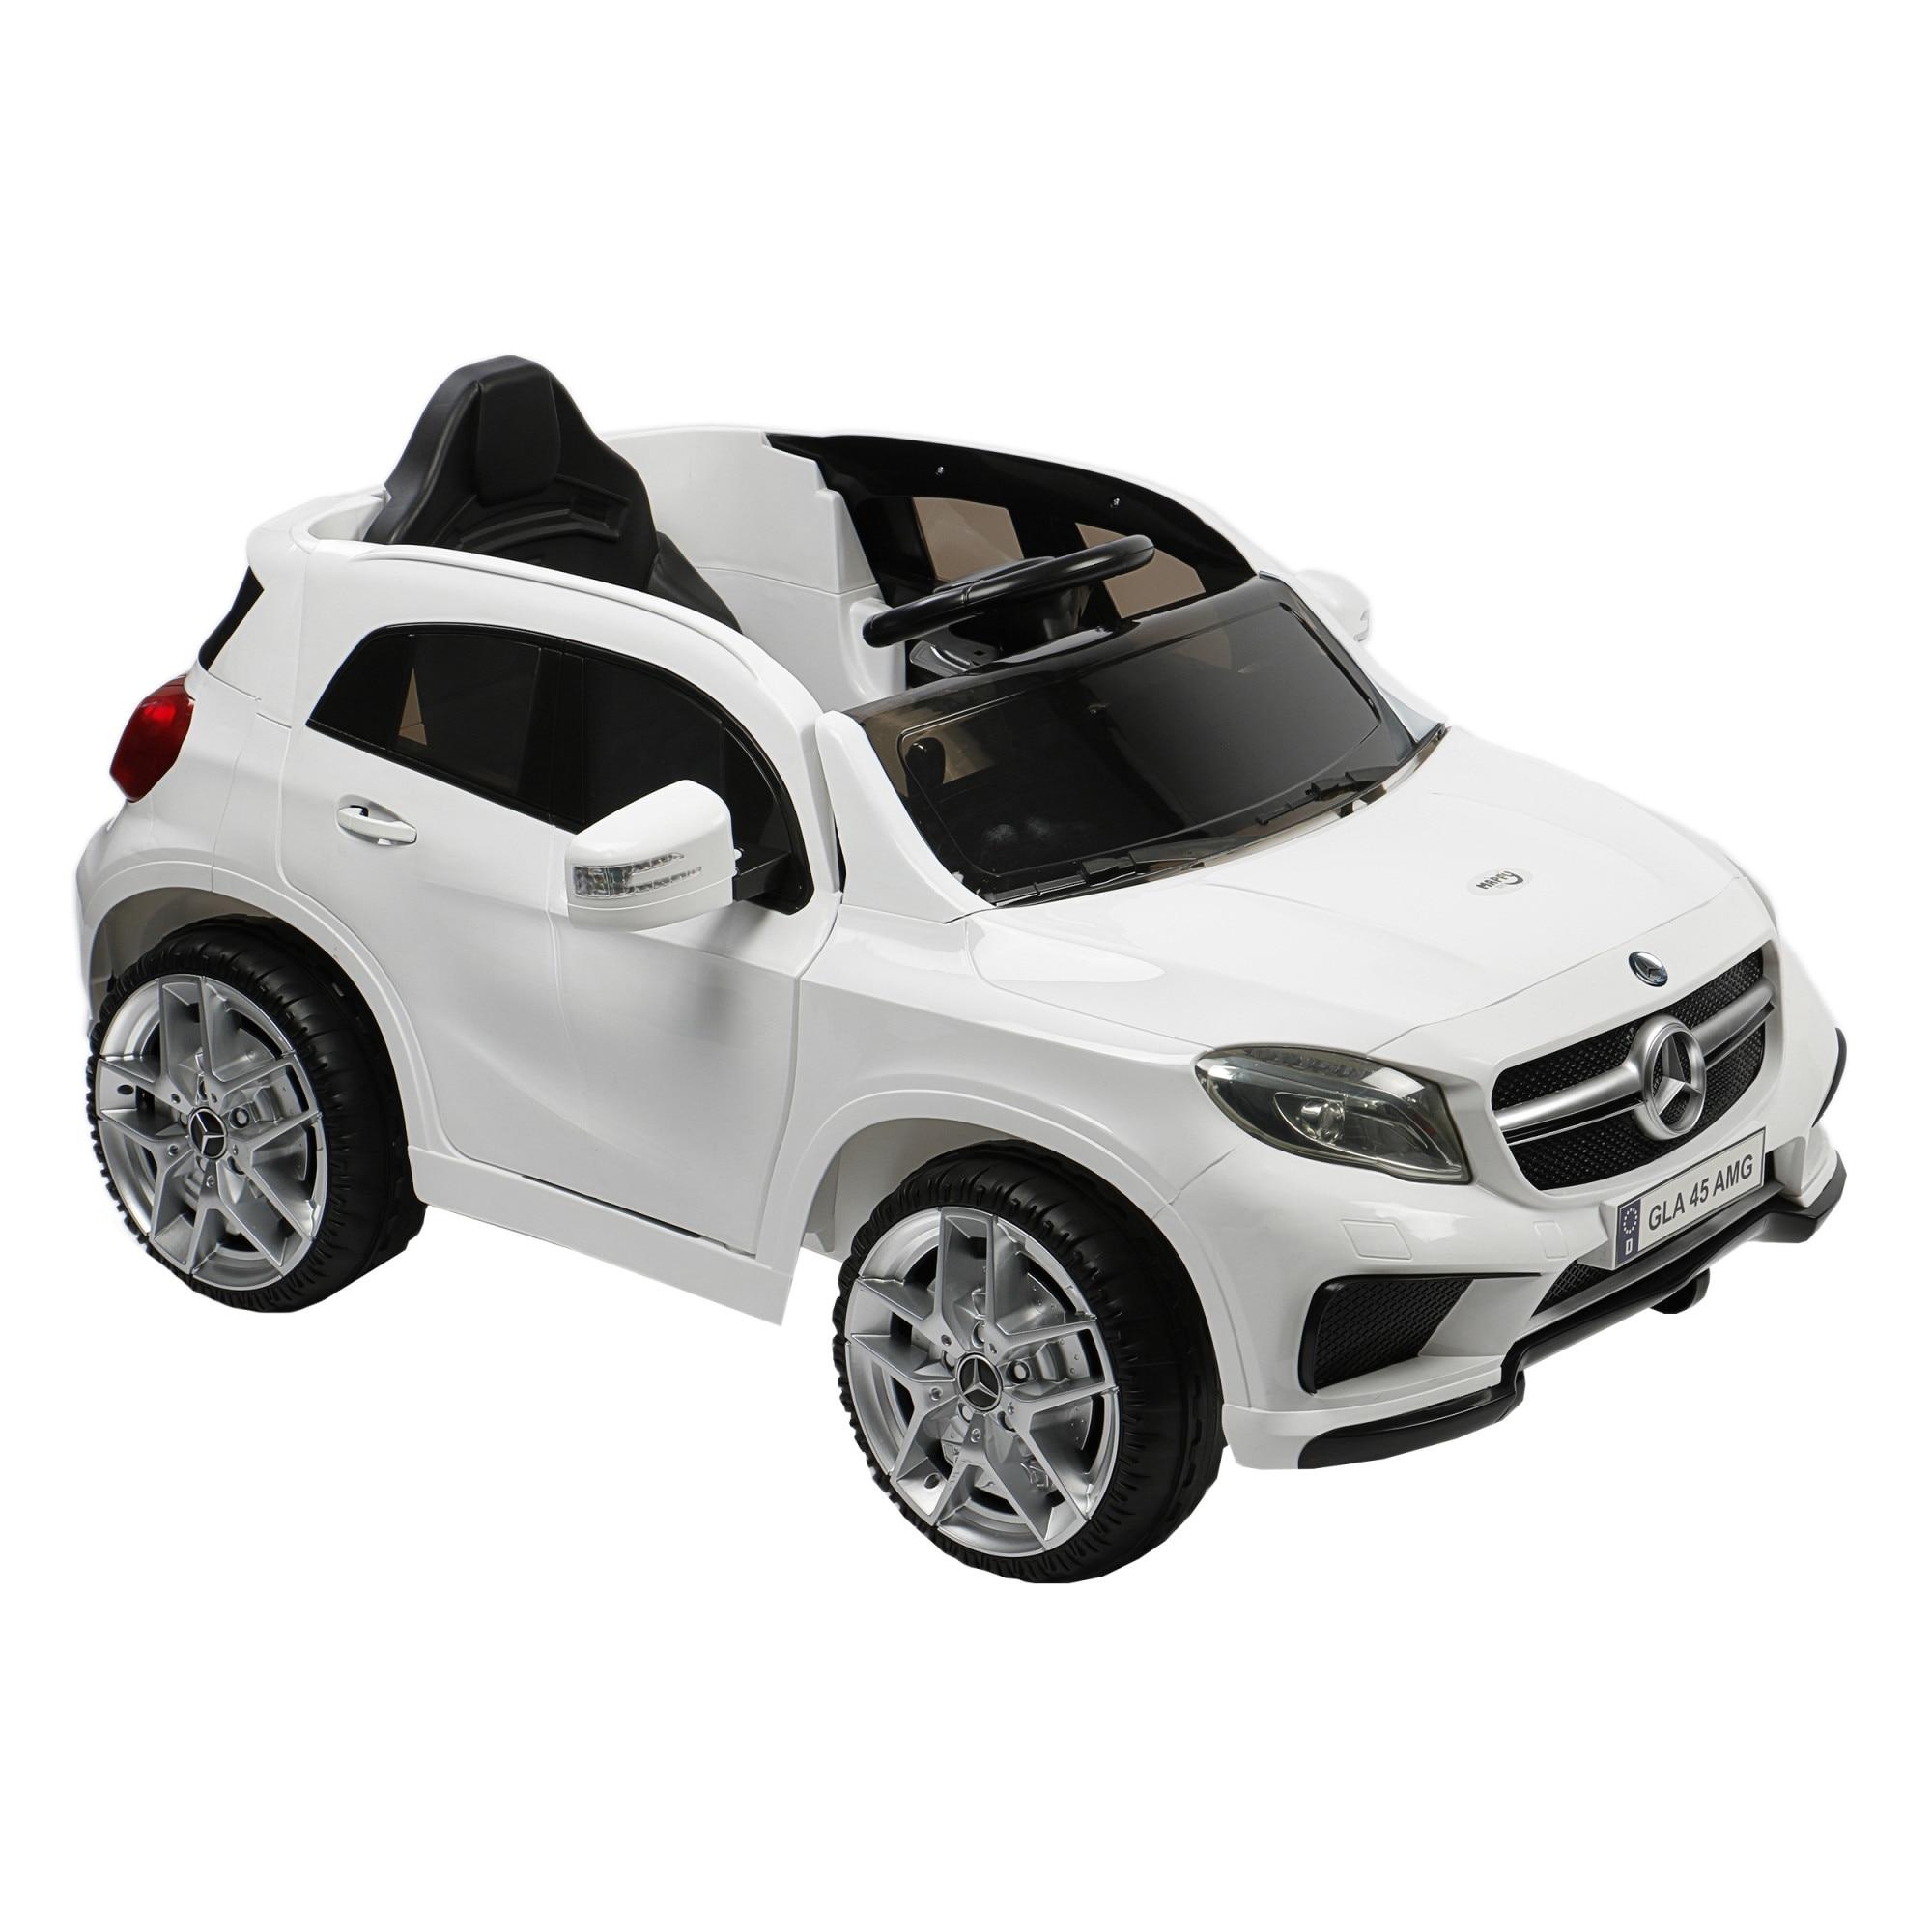 M Toys Elektromos Gyerekauto Taviranyitoval Mercedes Benz Gla 45 Amg Feher Emag Hu